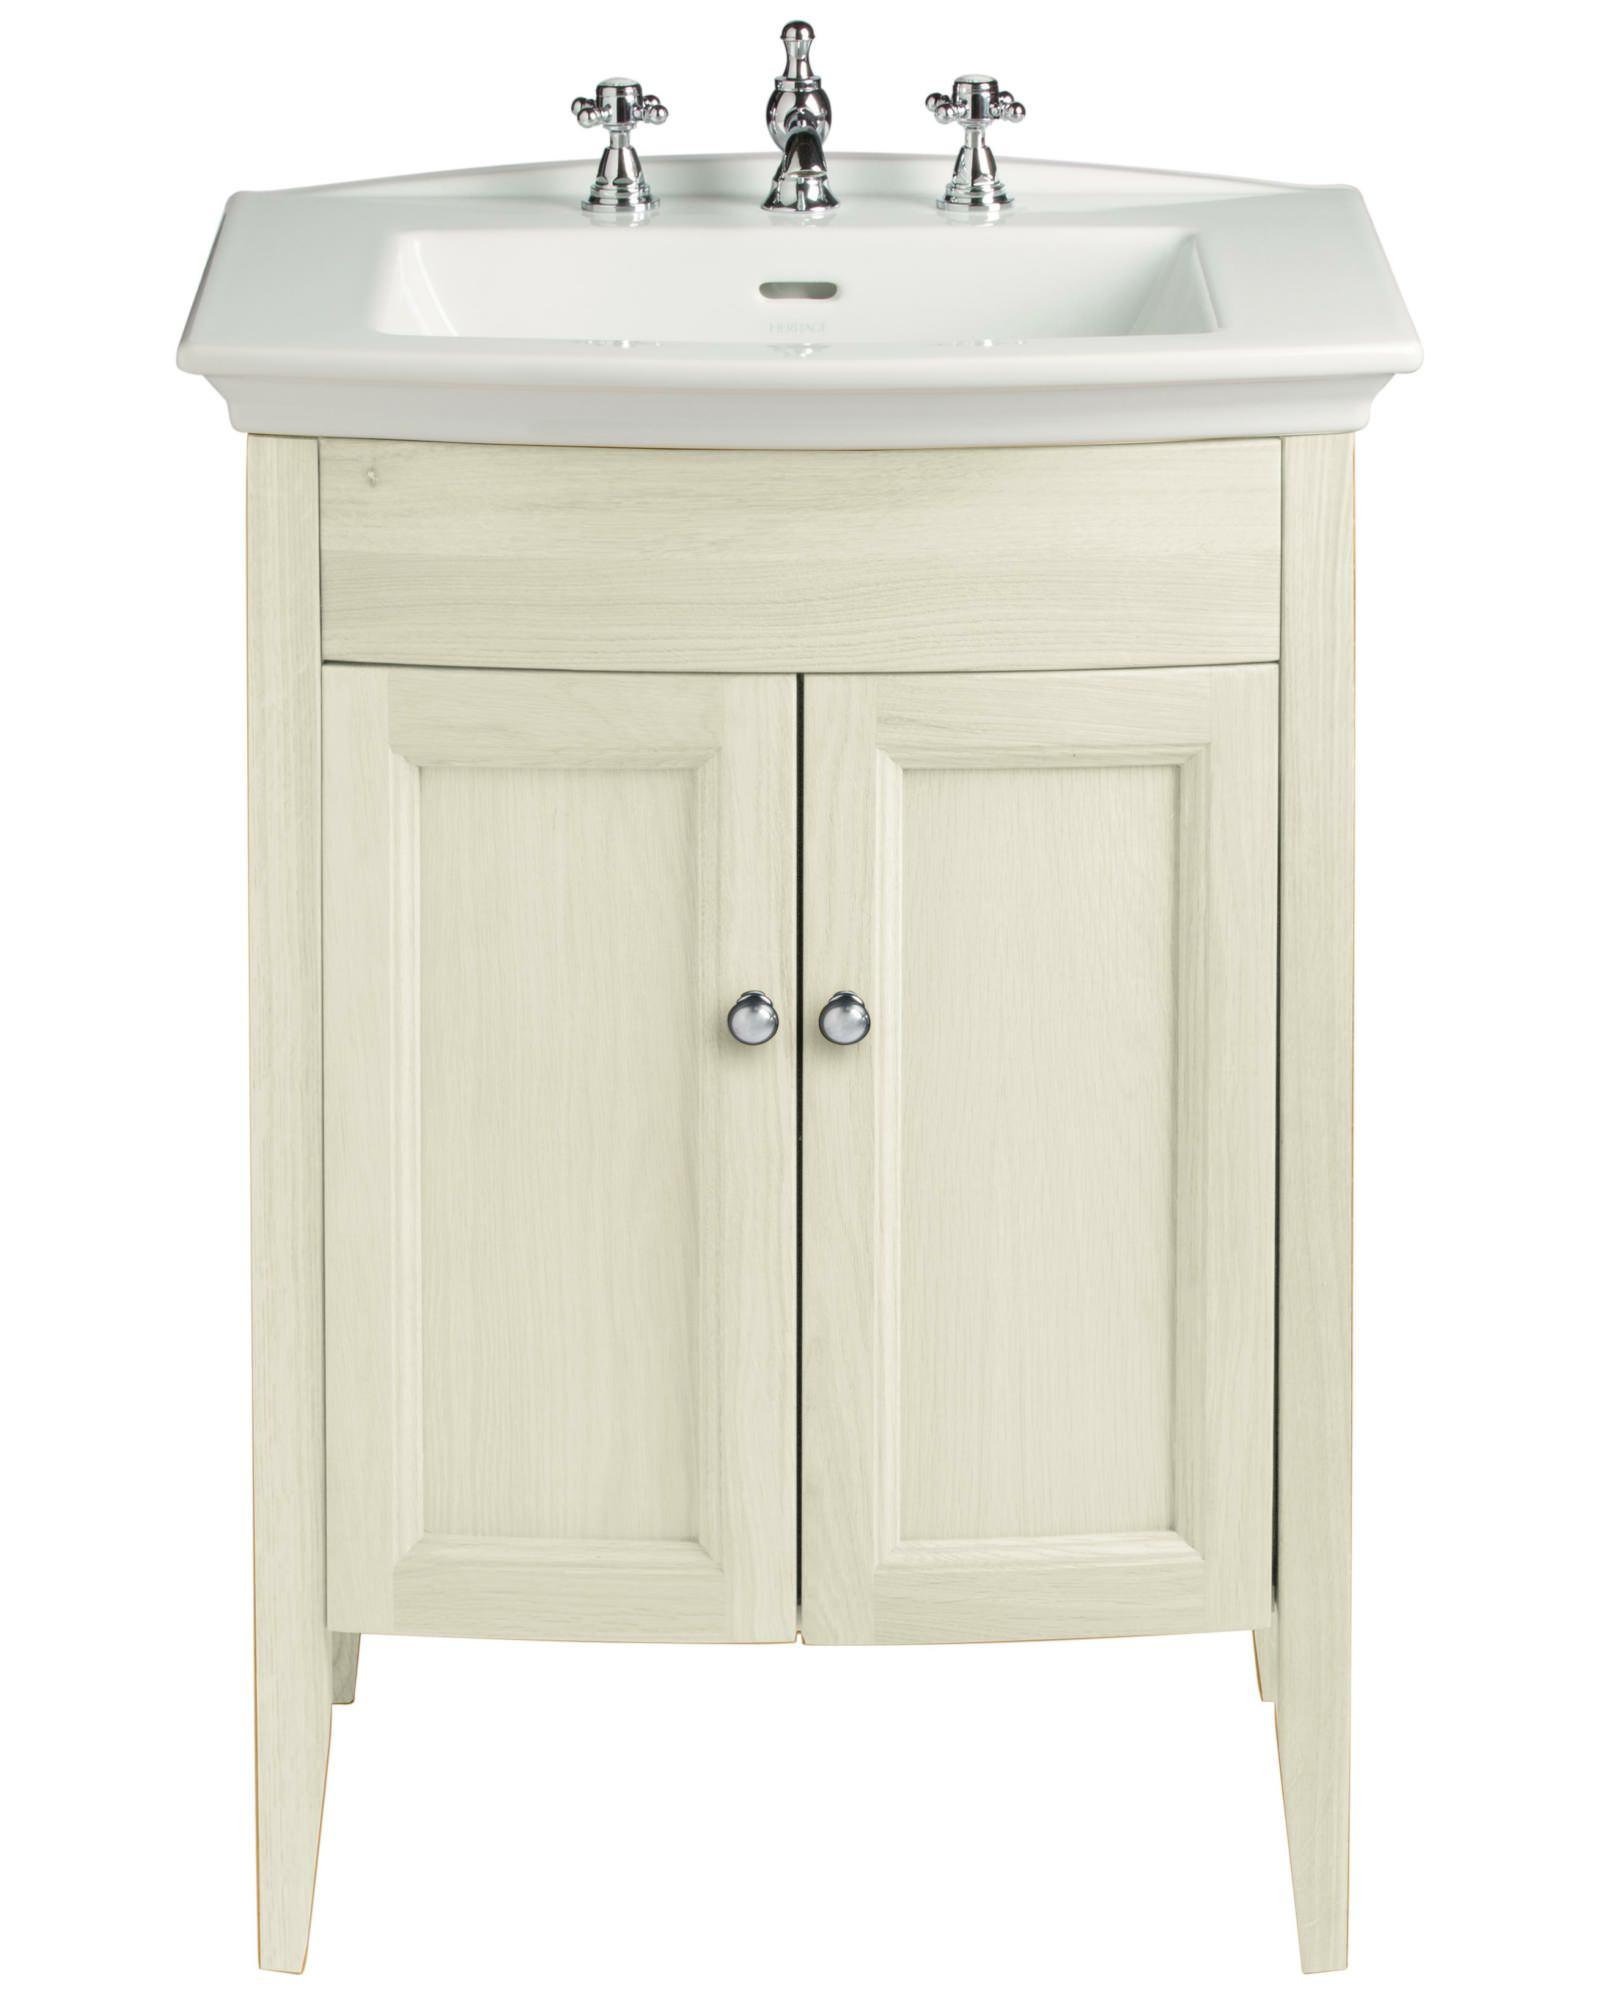 Heritage Bathroom Vanity: Heritage Caversham Oyster Vanity Unit For Blenheim Basin